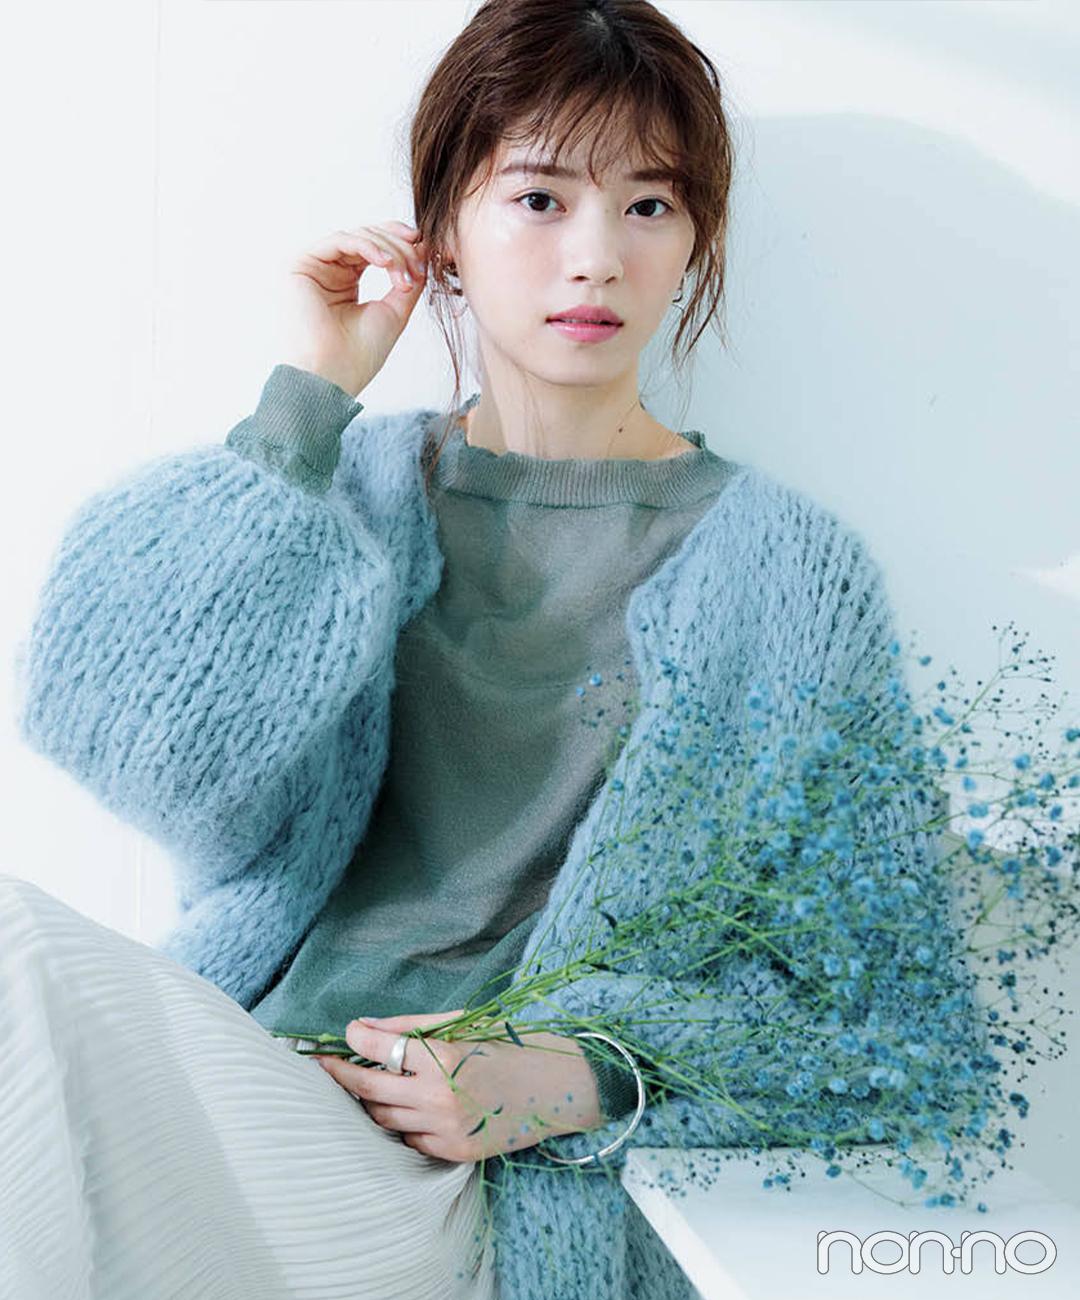 Photo Gallery|モデル・西野七瀬の最新フォトギャラリーを見る_1_19